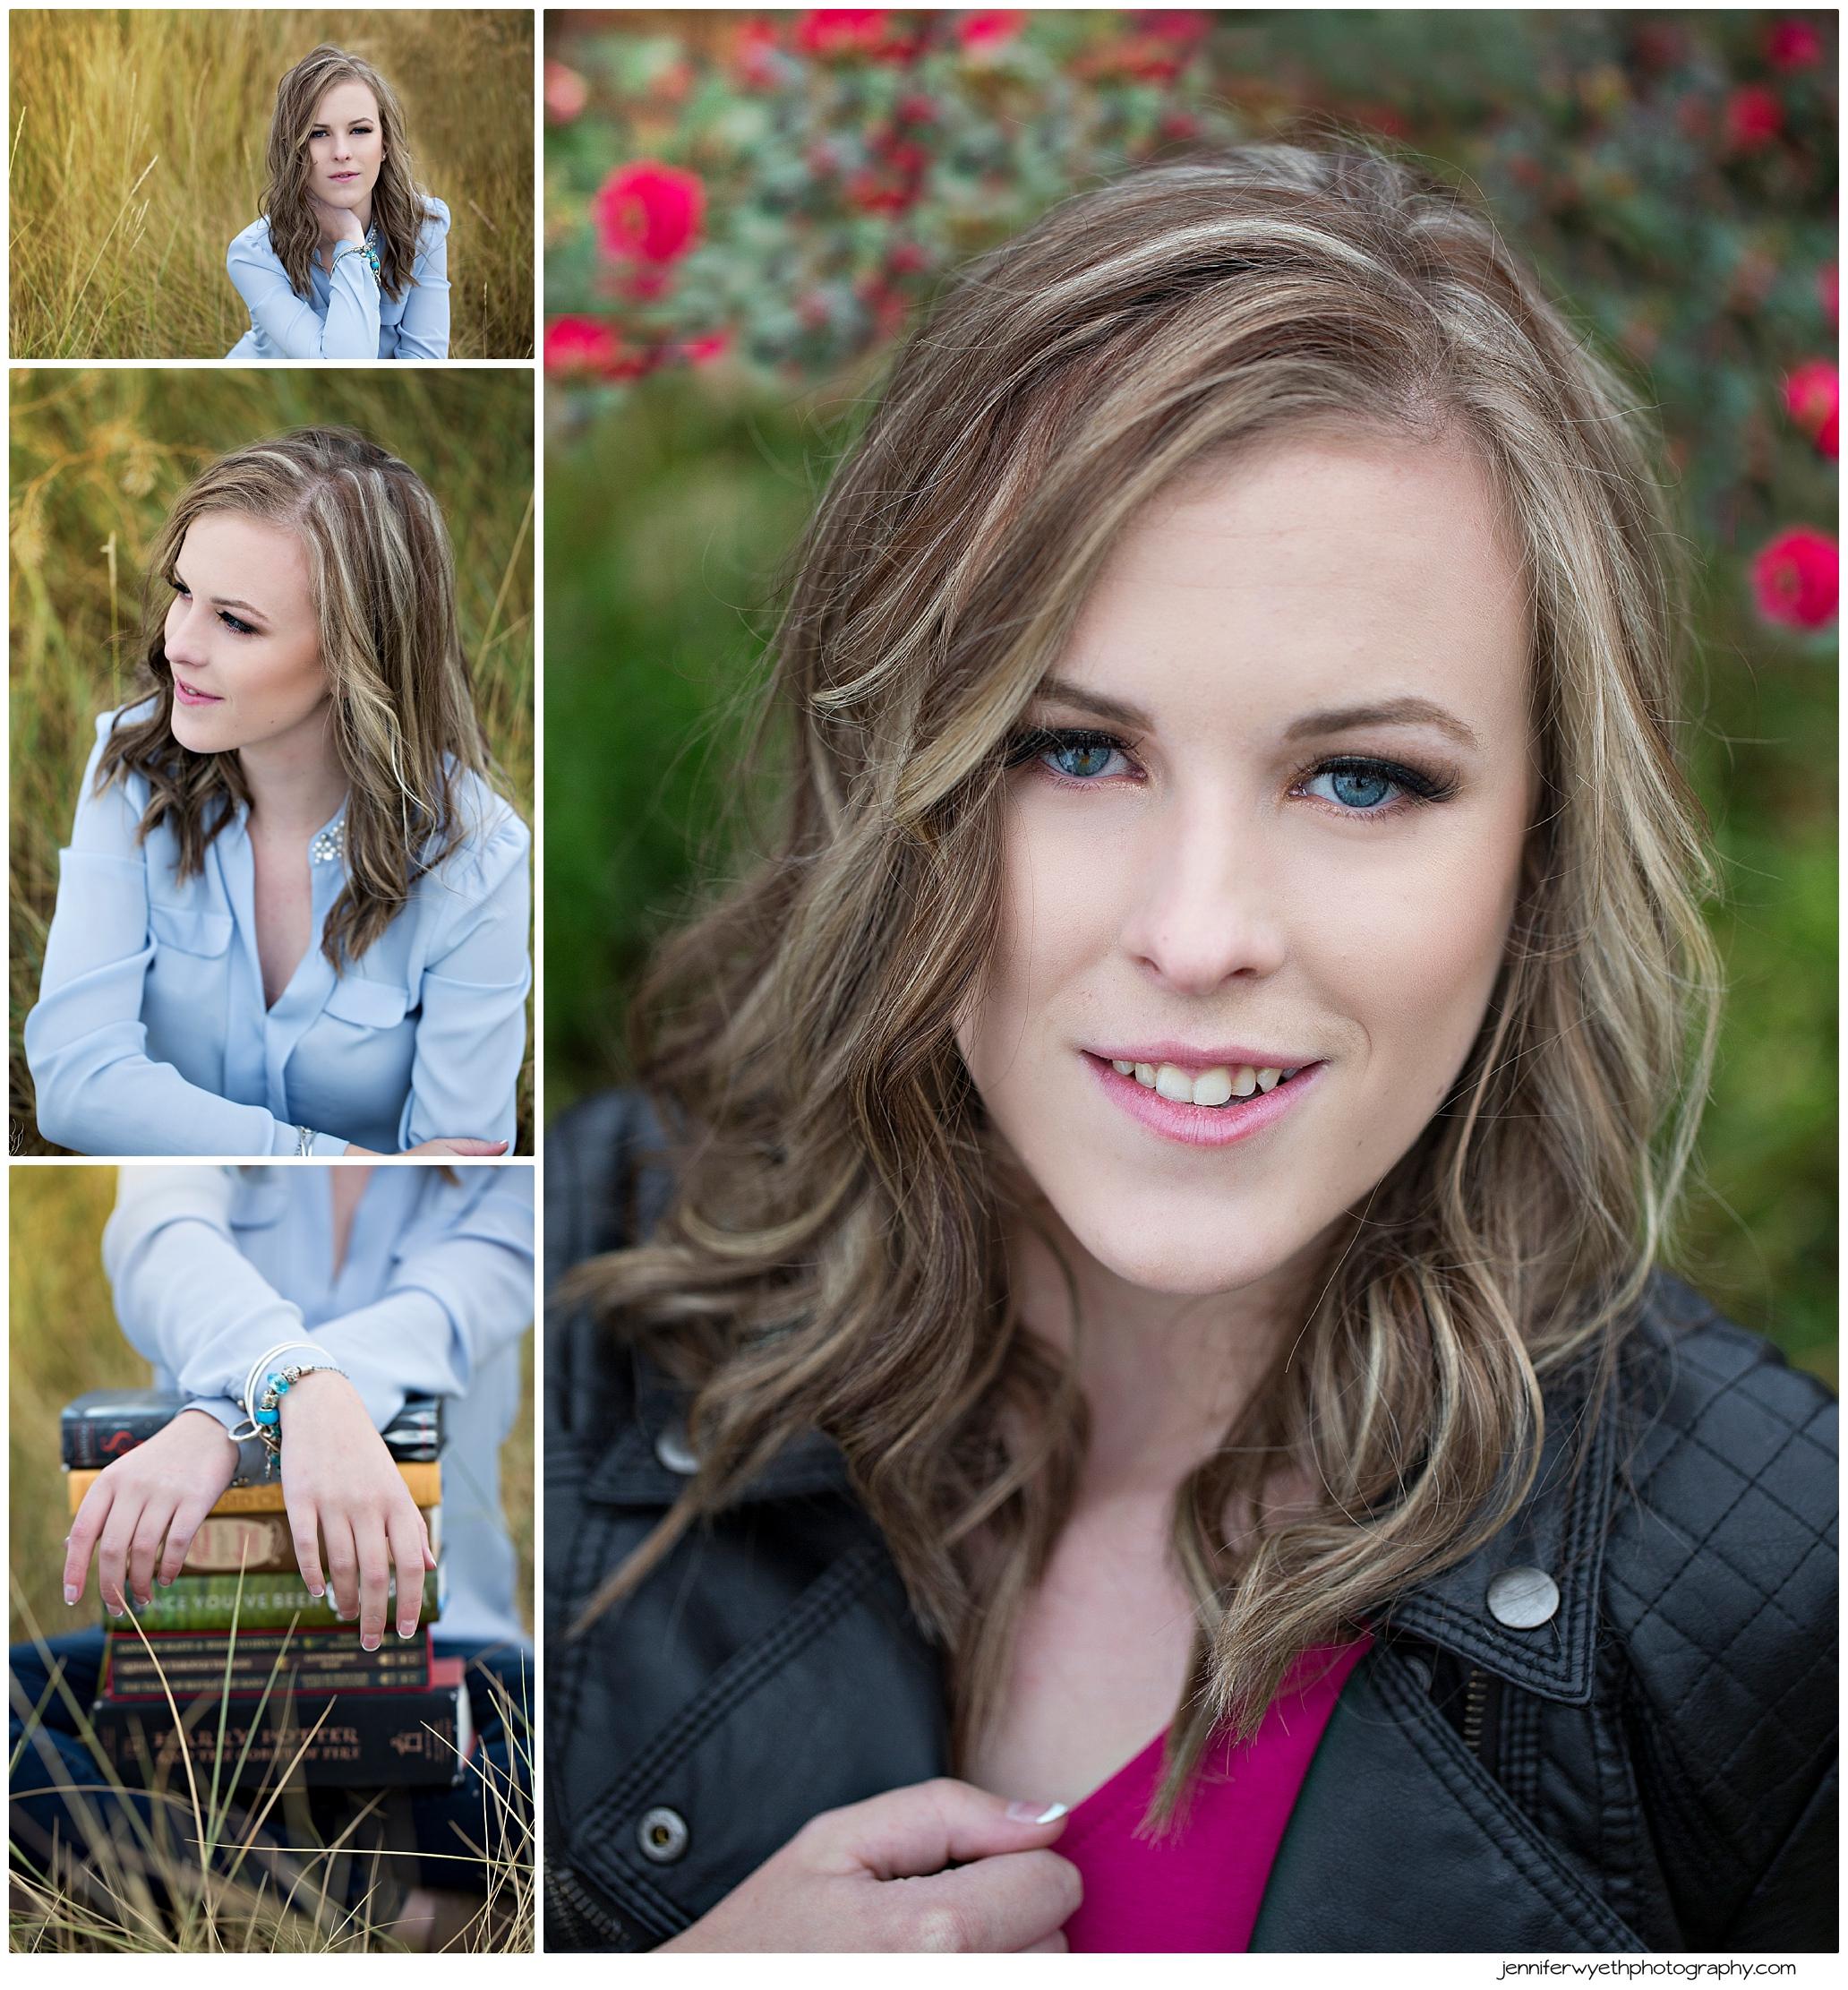 Jennifer-Wyeth-photography-senior-pictures-colorado-springs-photographer_0194.jpg